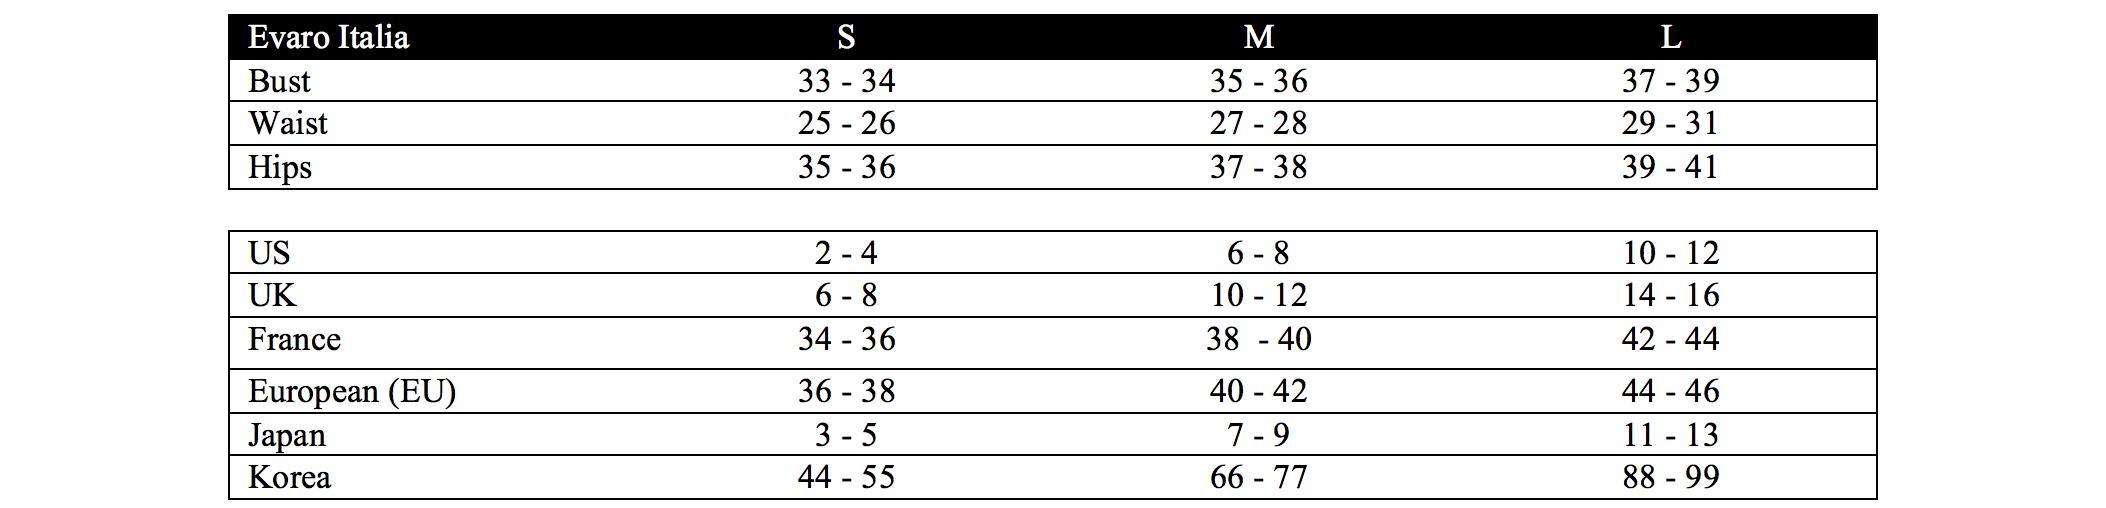 Evaro Italia Size Chart.png